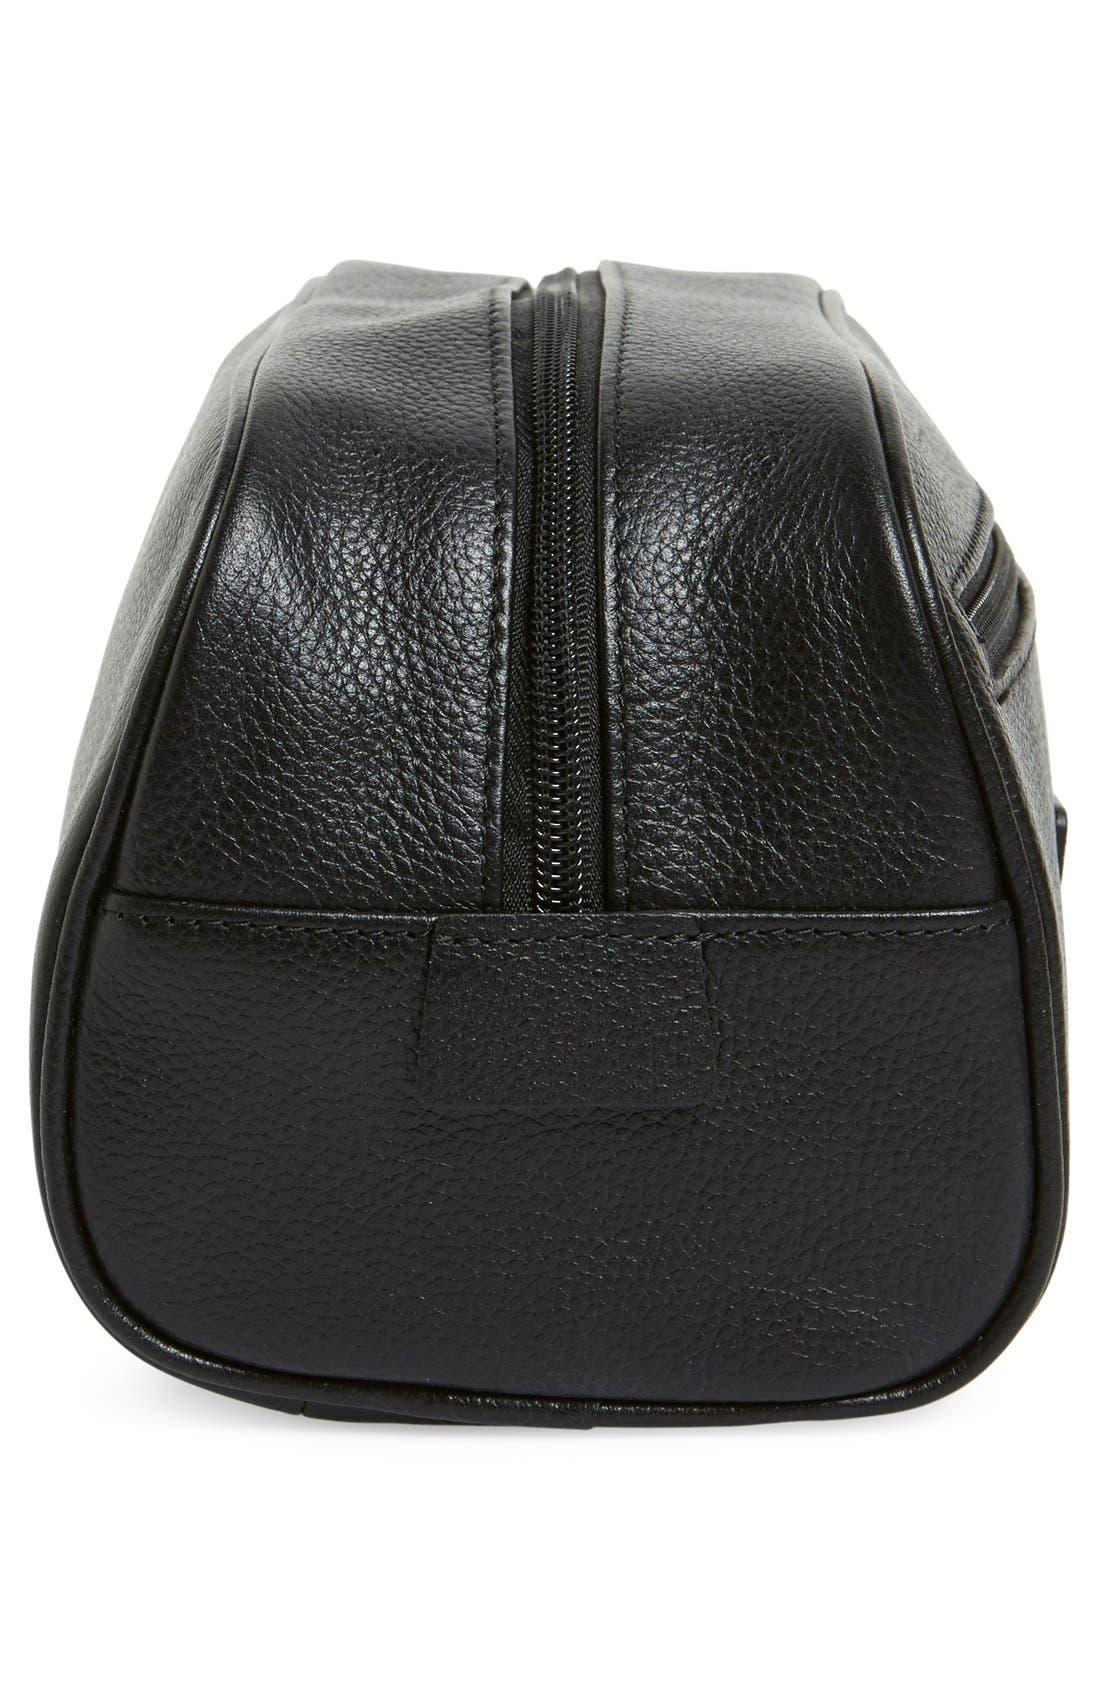 Leather Travel Kit,                             Alternate thumbnail 4, color,                             001